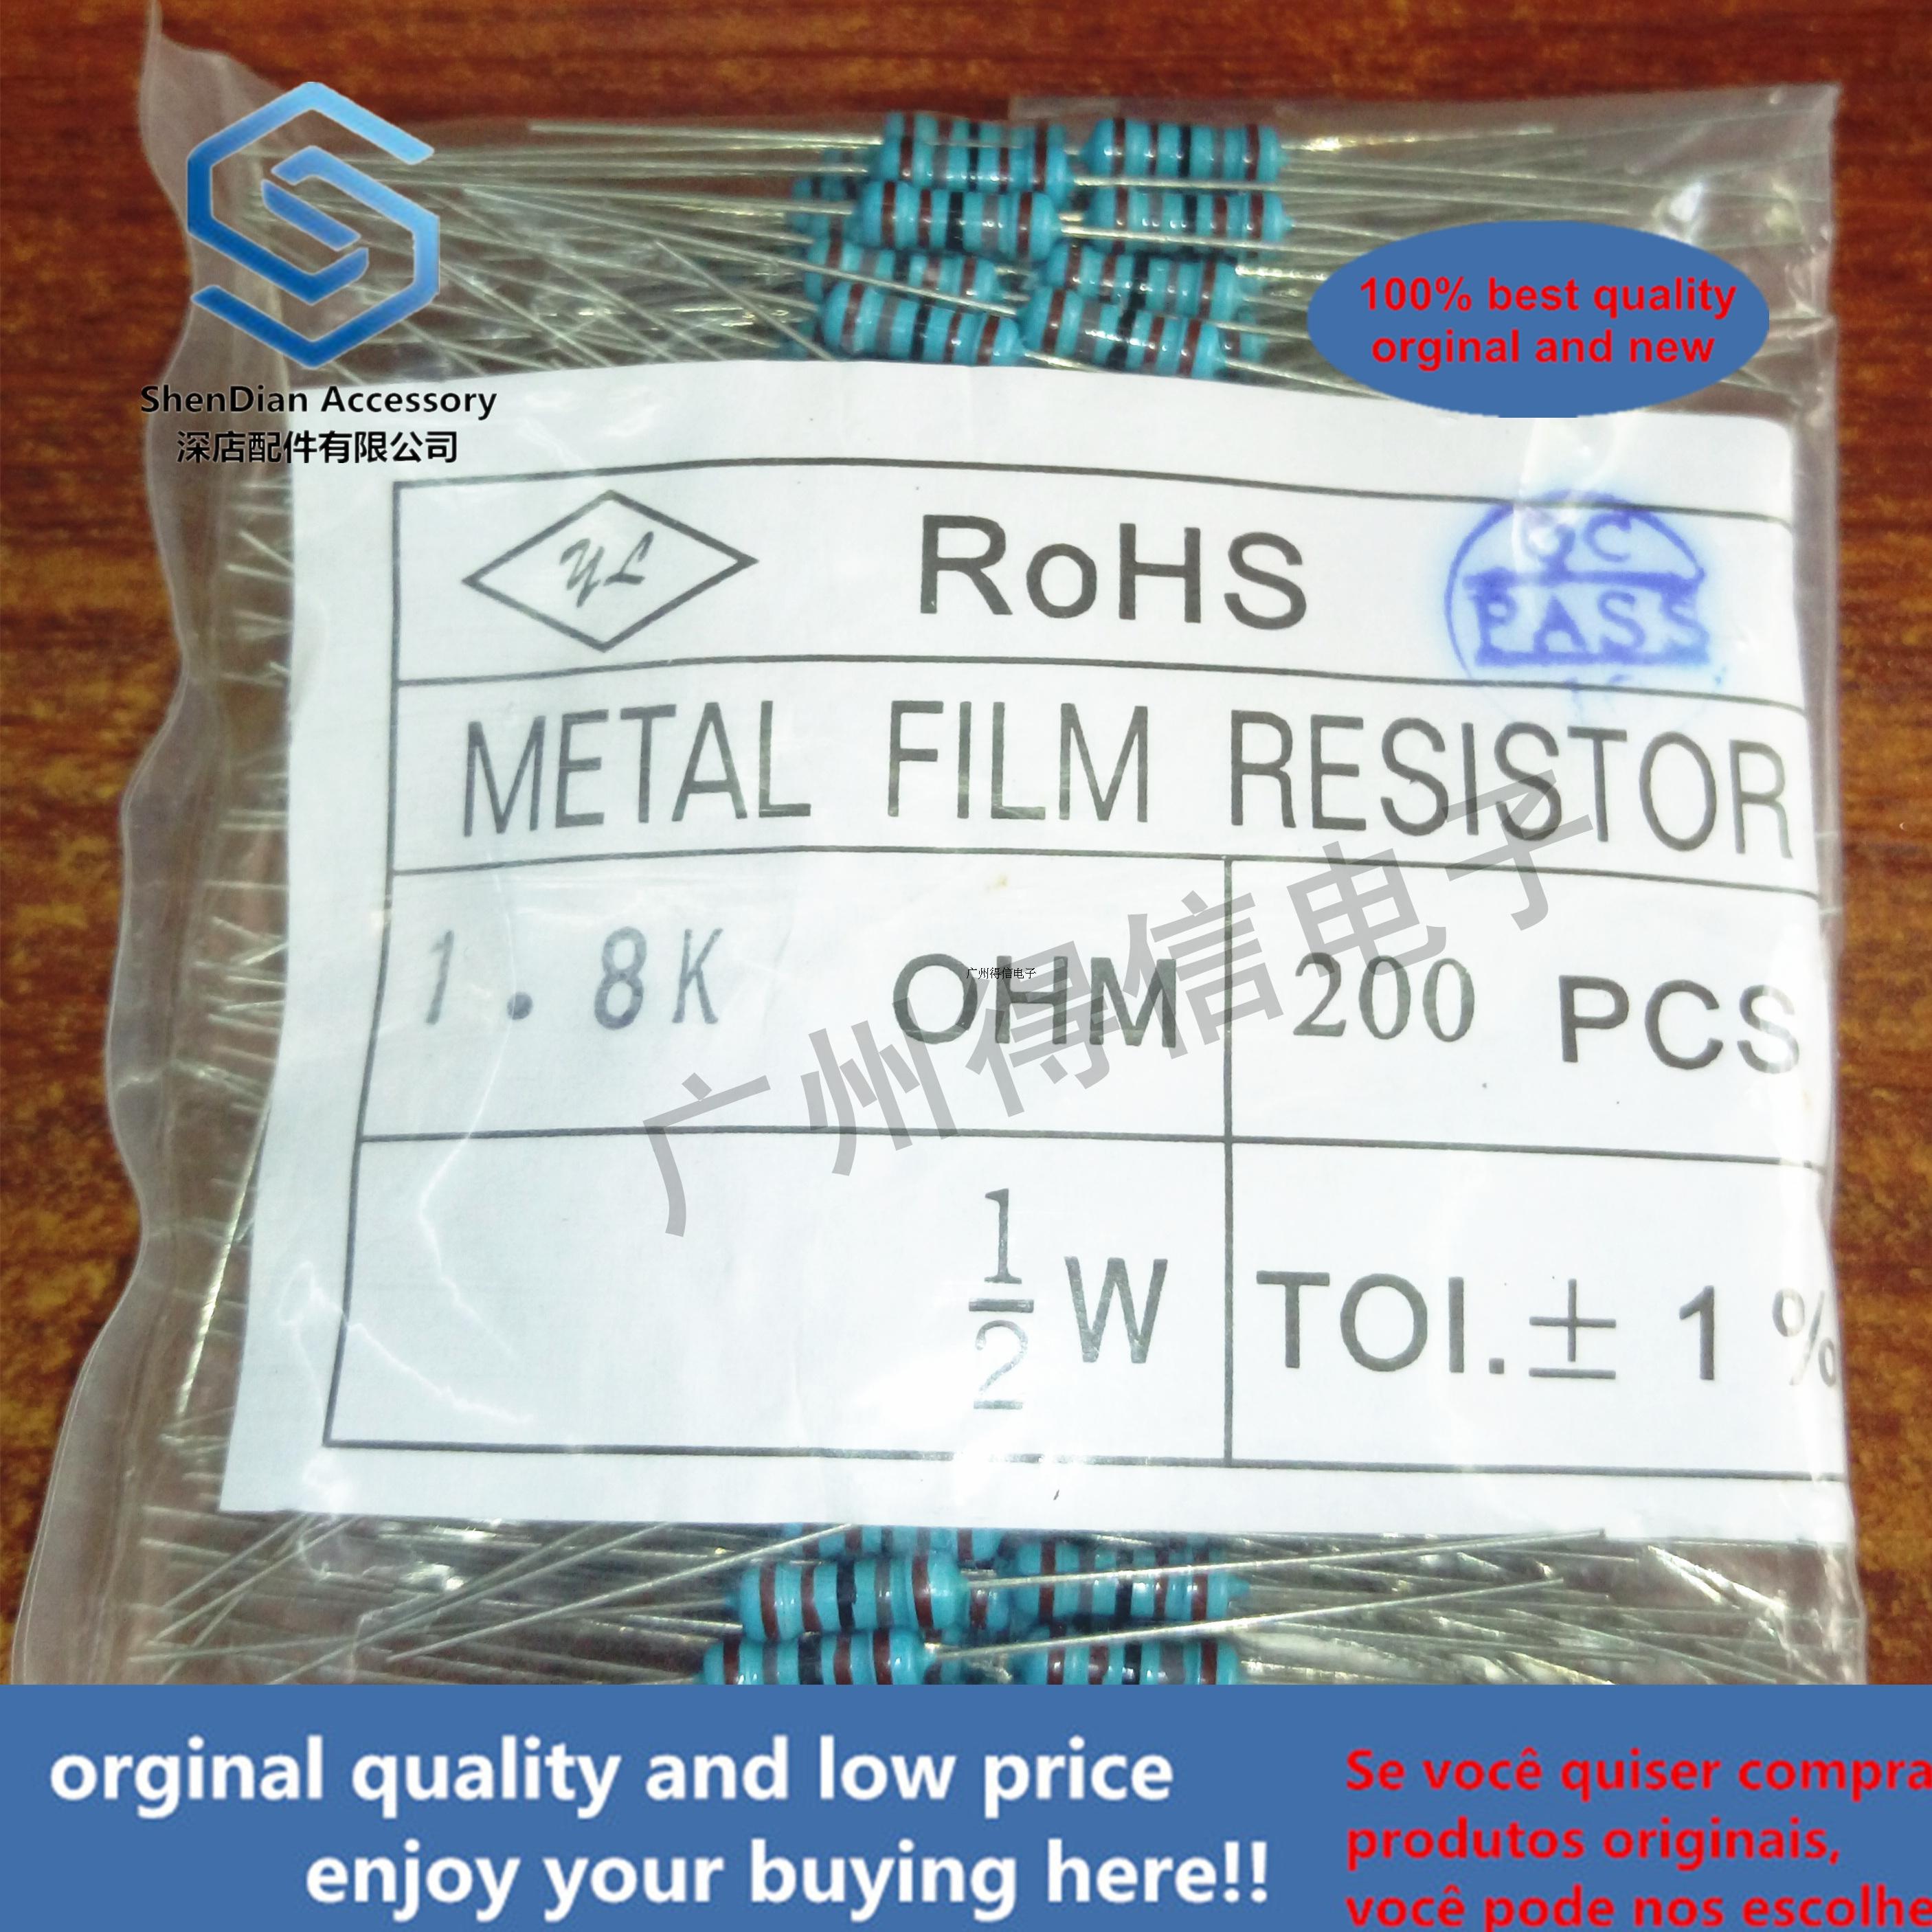 200pcs 1 / 2W 51K 1% Brand New Metal Film Iron Feet Resistor Bag 200 Pcs Per Pack